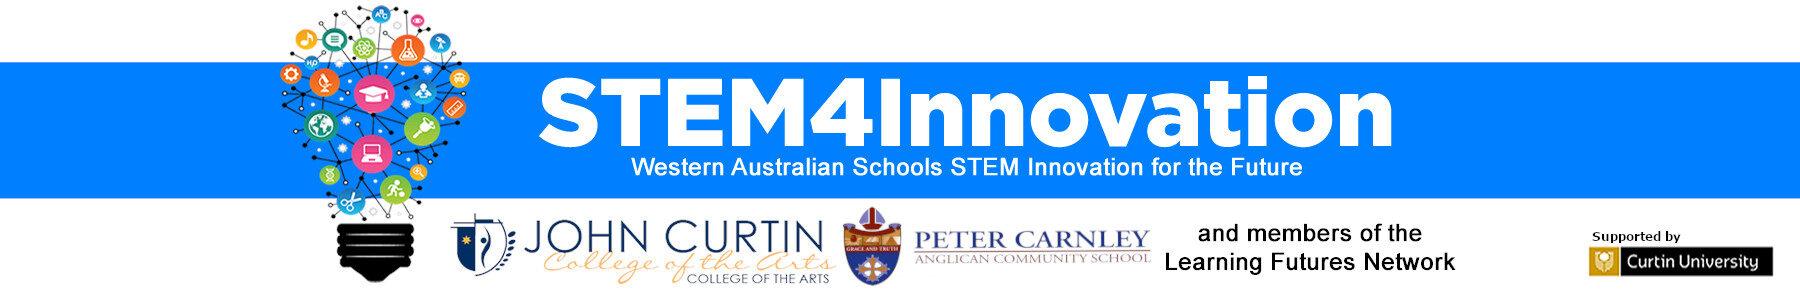 STEM4Innovation